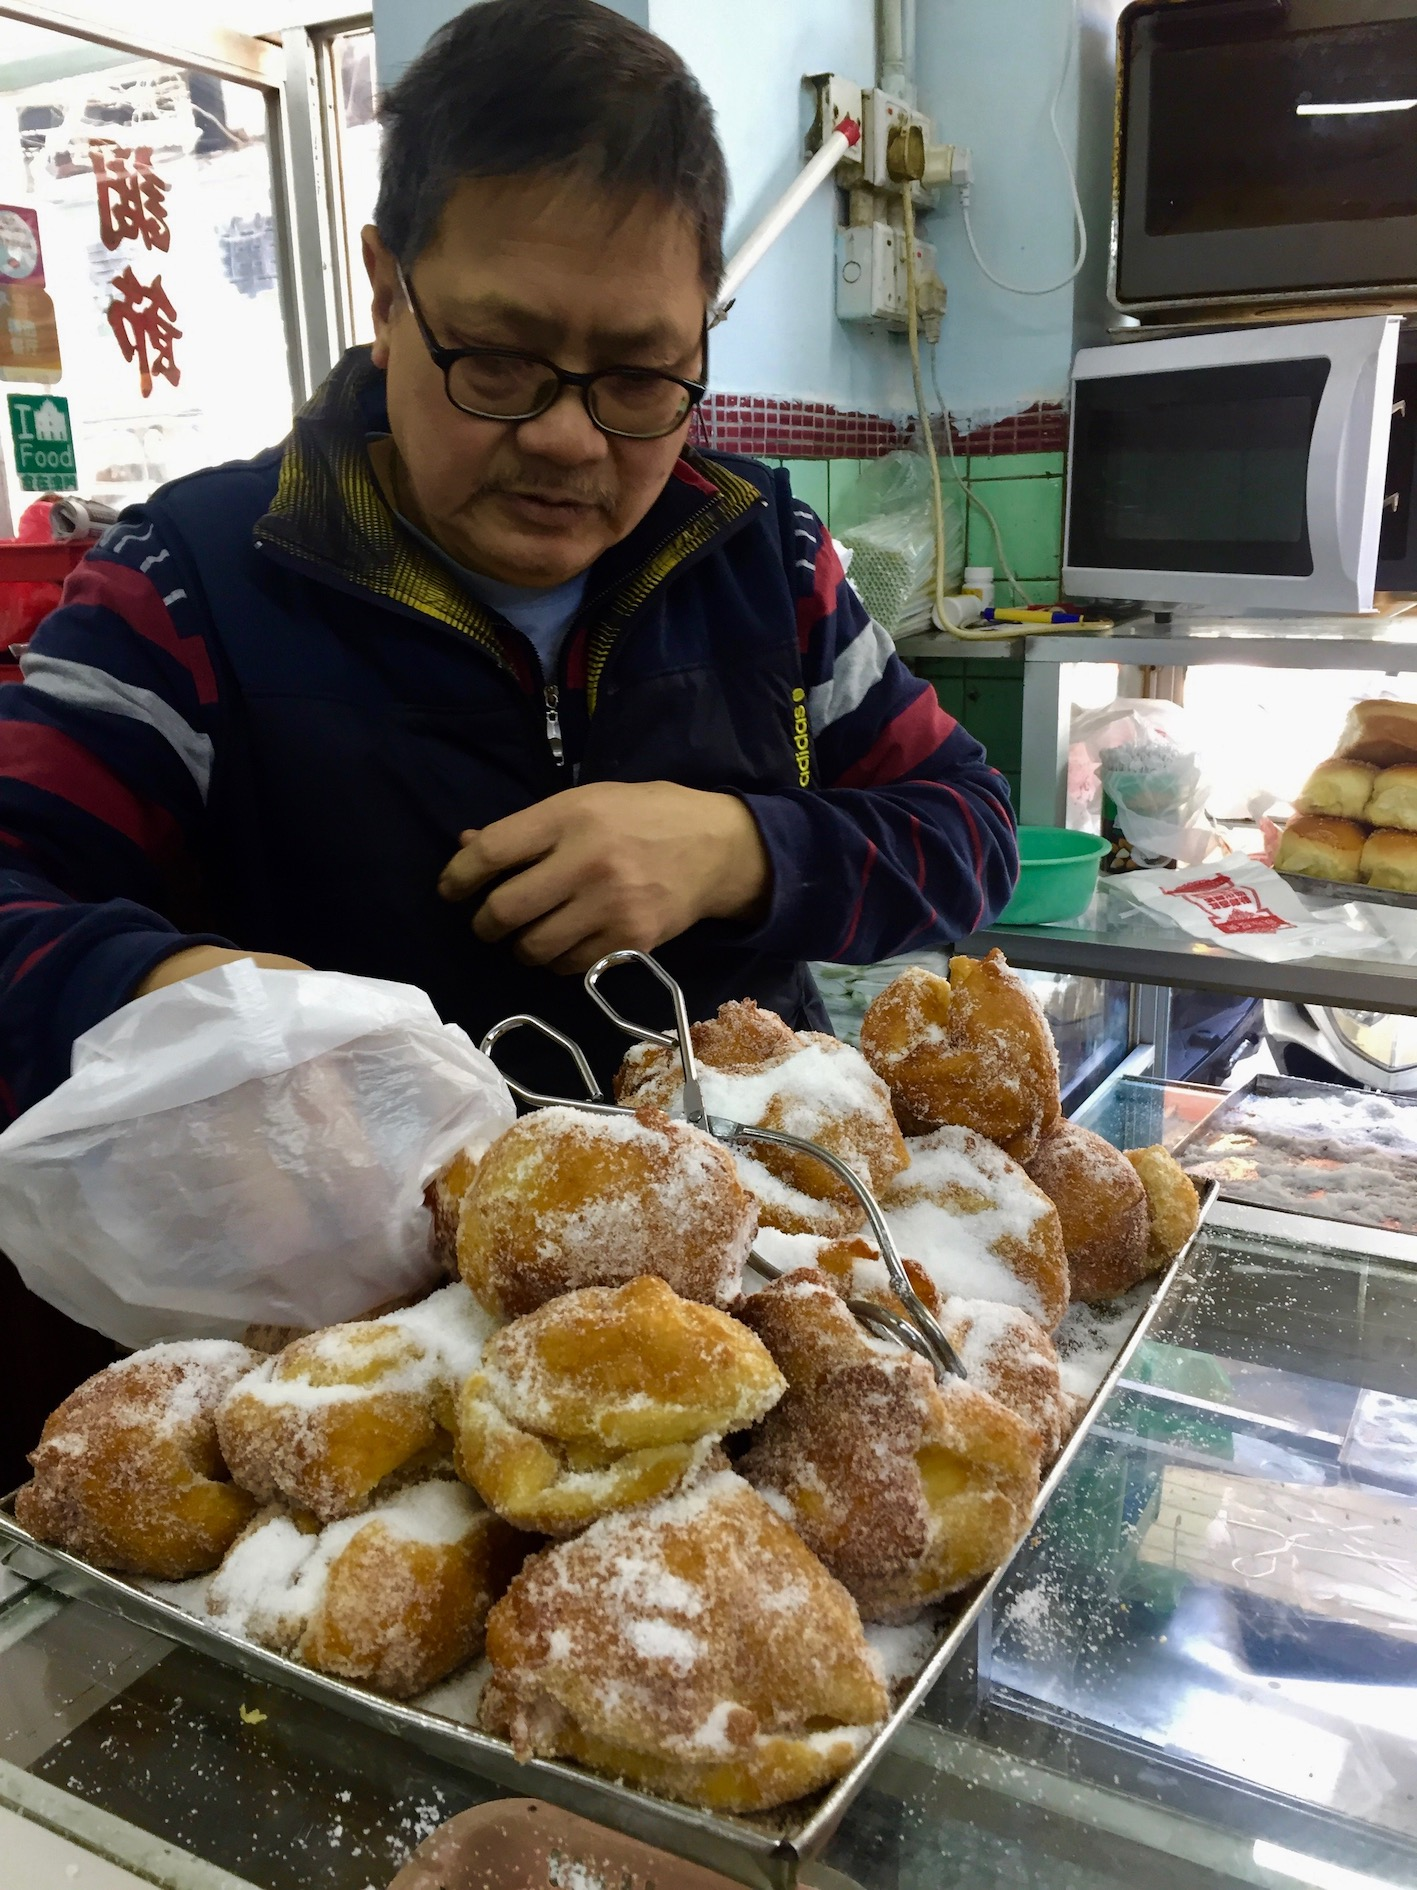 Sugared donuts Nam Peng Cafe macau